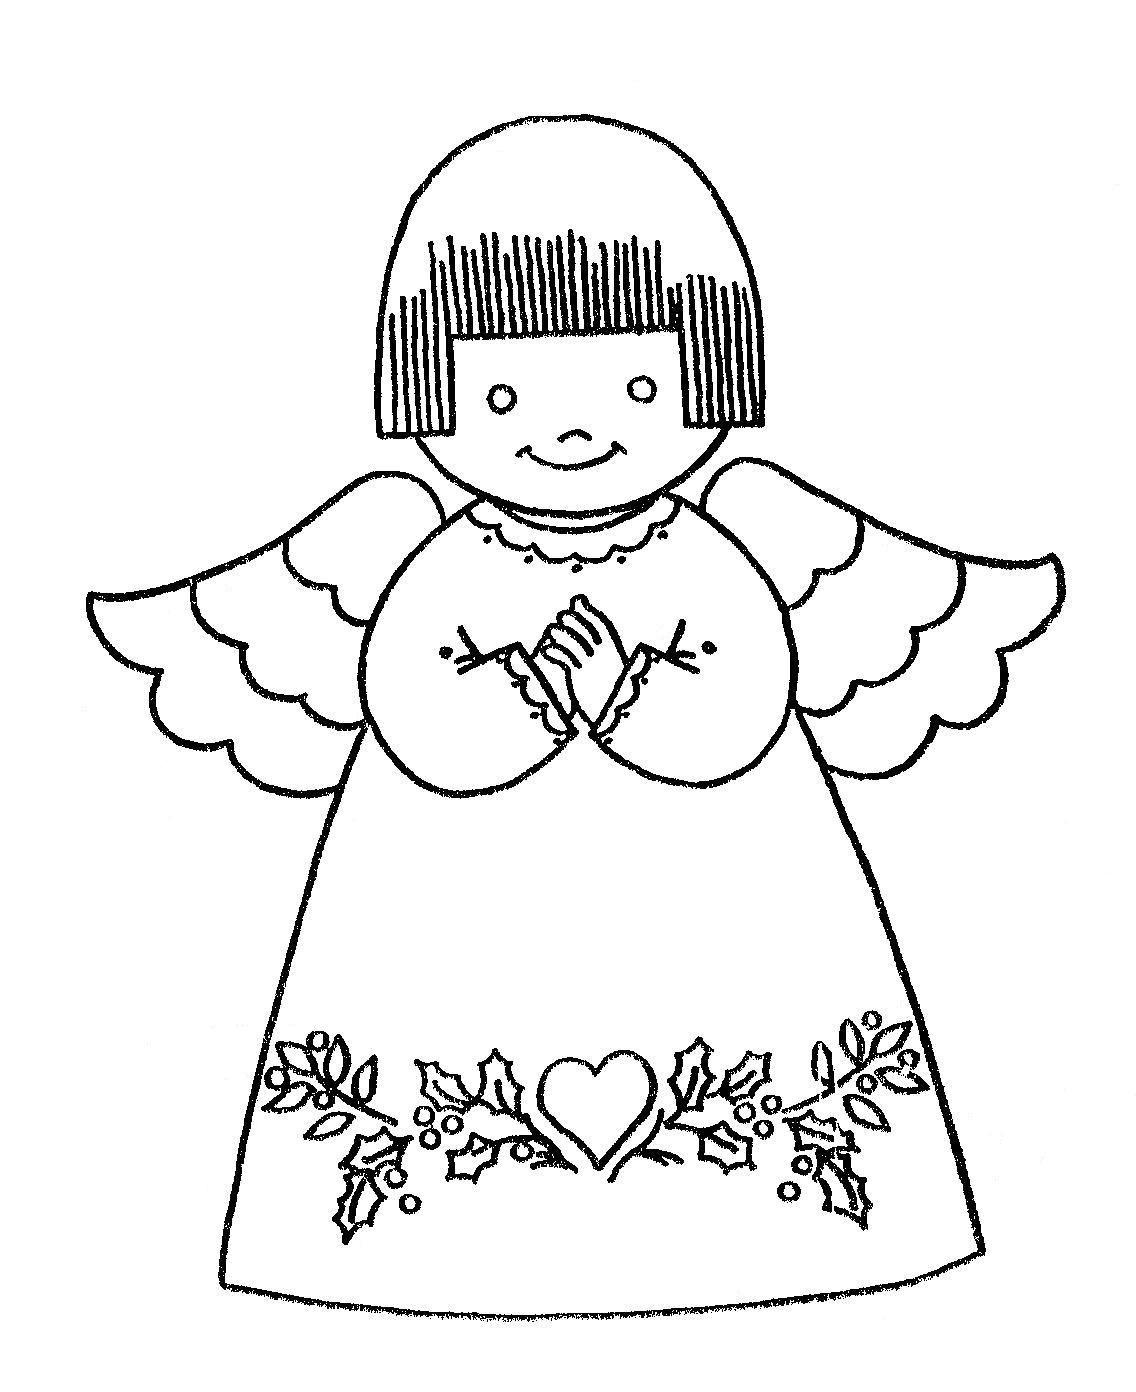 [11-angel 28[2].jpg]